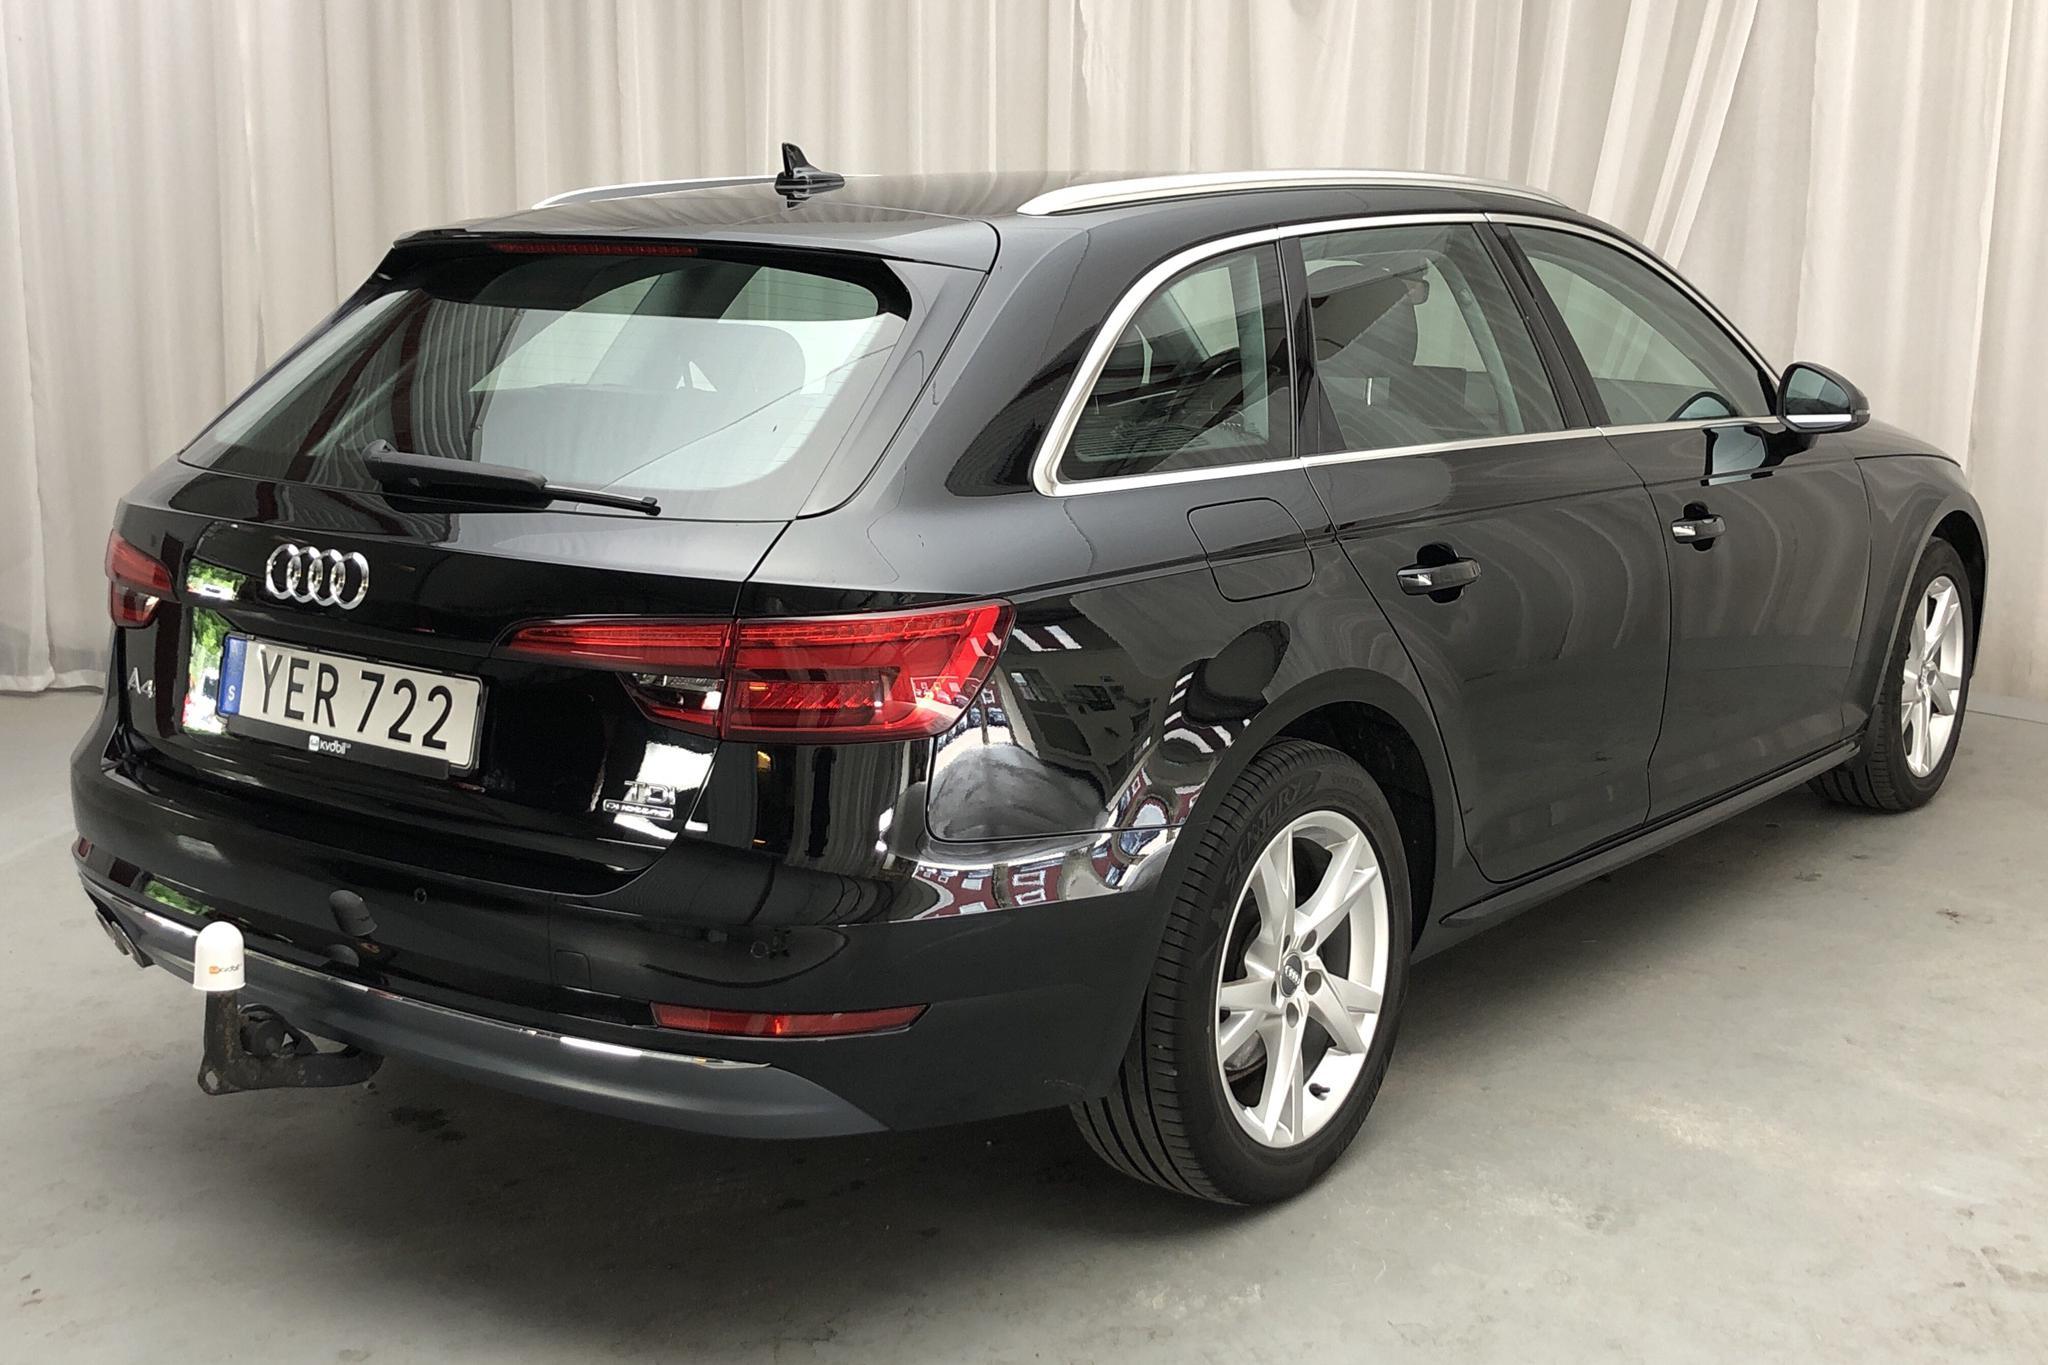 Audi A4 2.0 TDI Avant quattro (190hk) - 101 270 km - Automatic - black - 2016